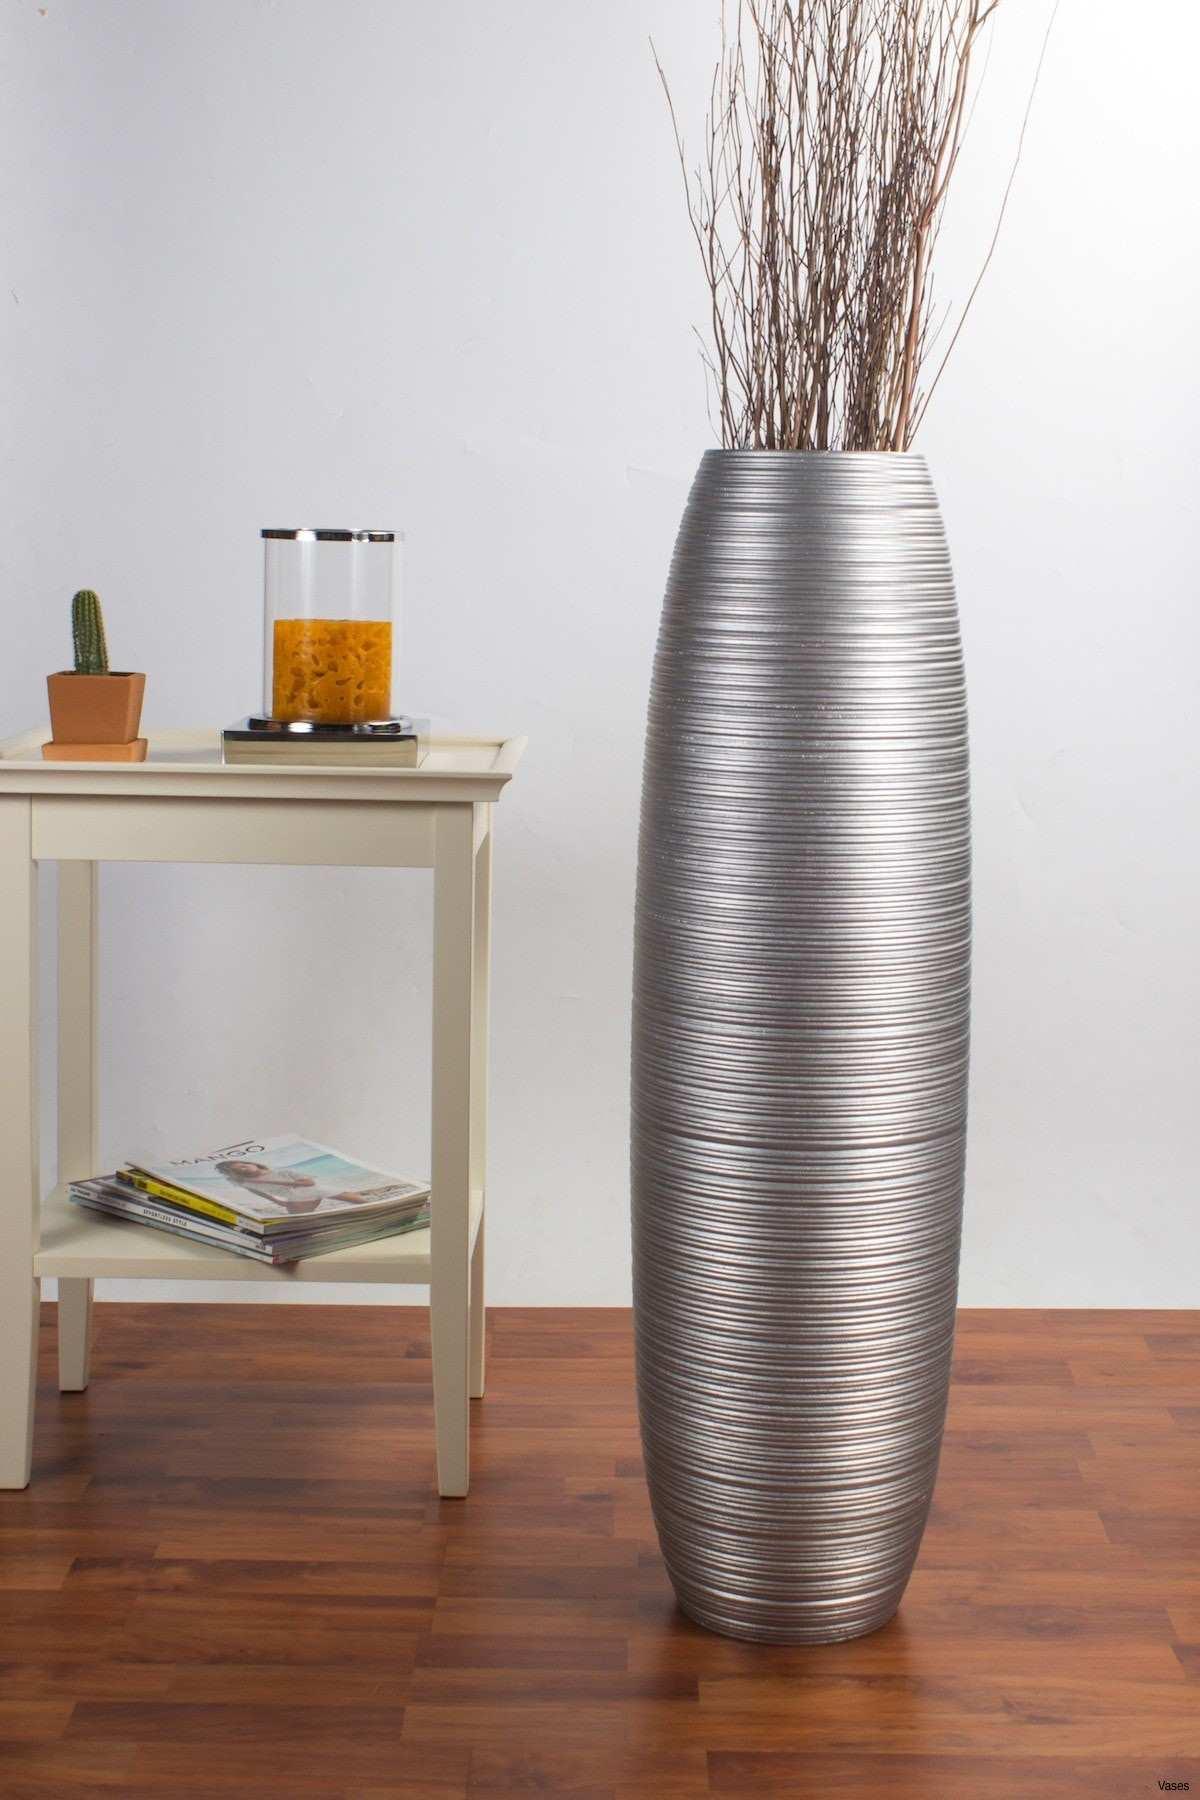 modern flower vase designs of decorating ideas for vases elegant modern living room vases with regard to decorating ideas for vases luxury tall floor vase decoration ideas room design decor modern house of